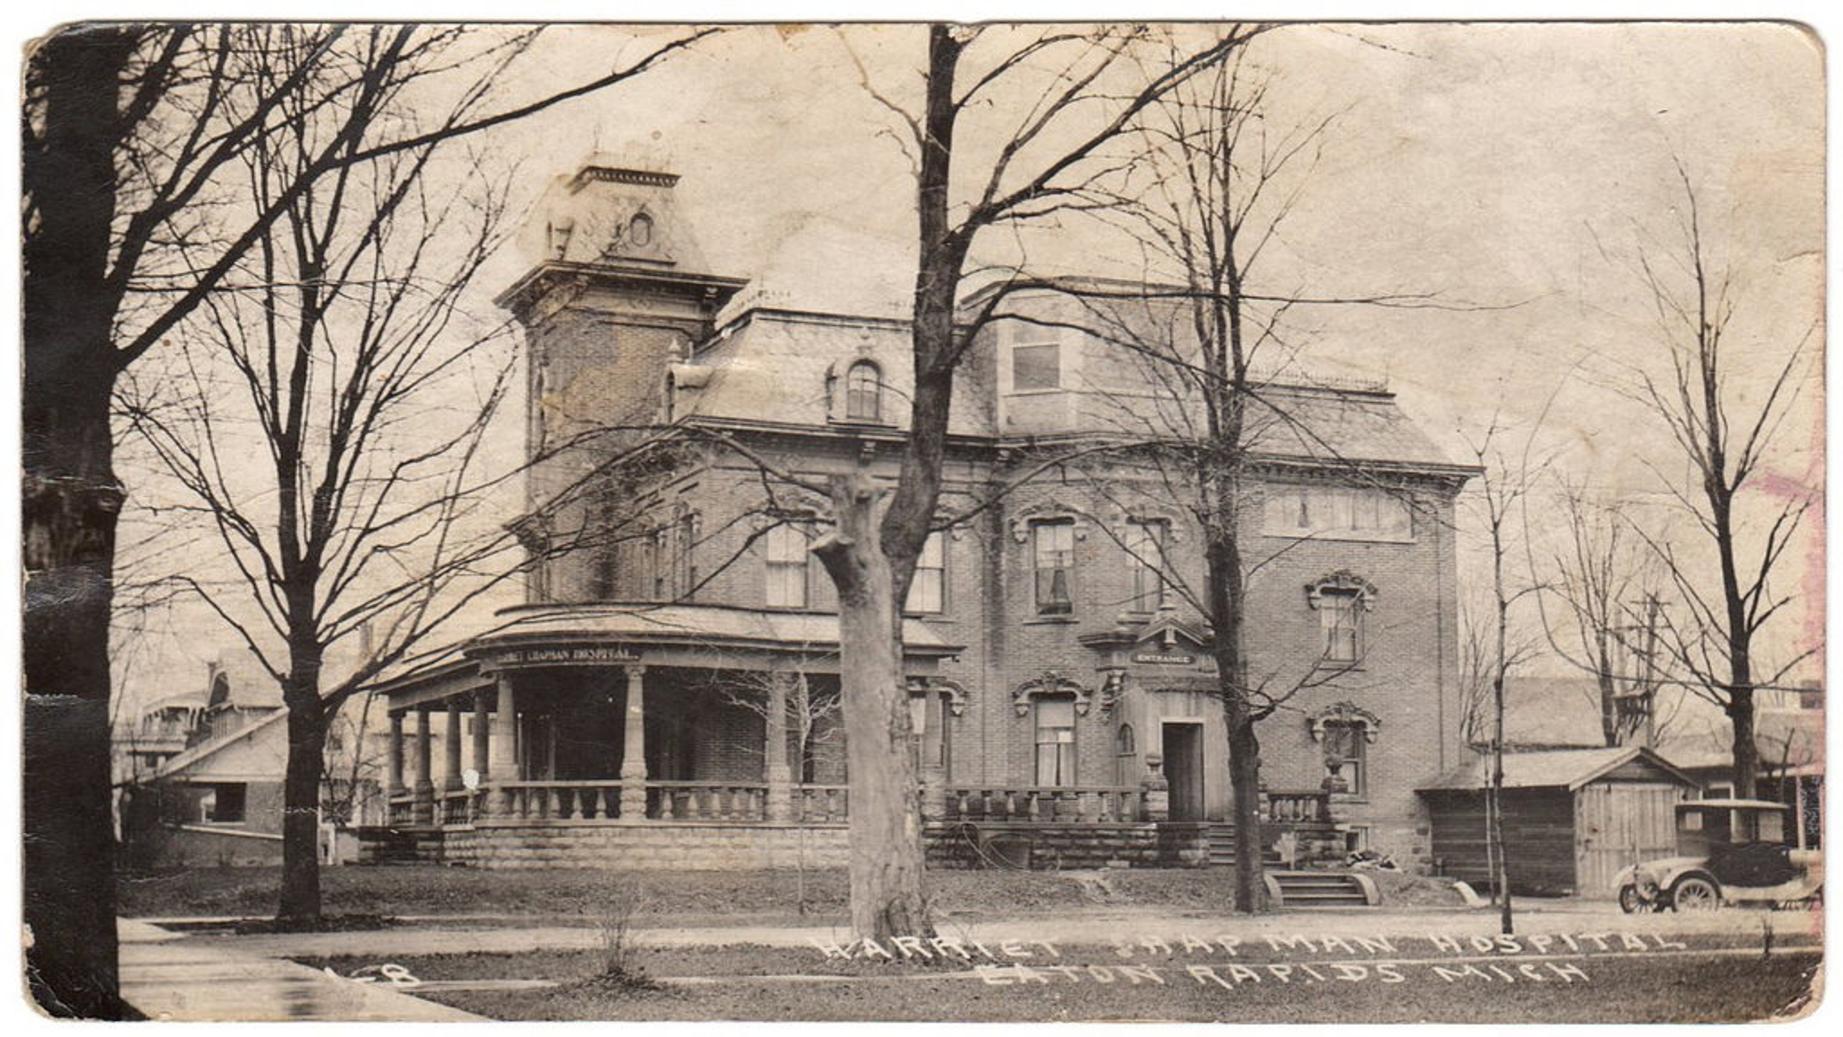 Stimson haunted hospital